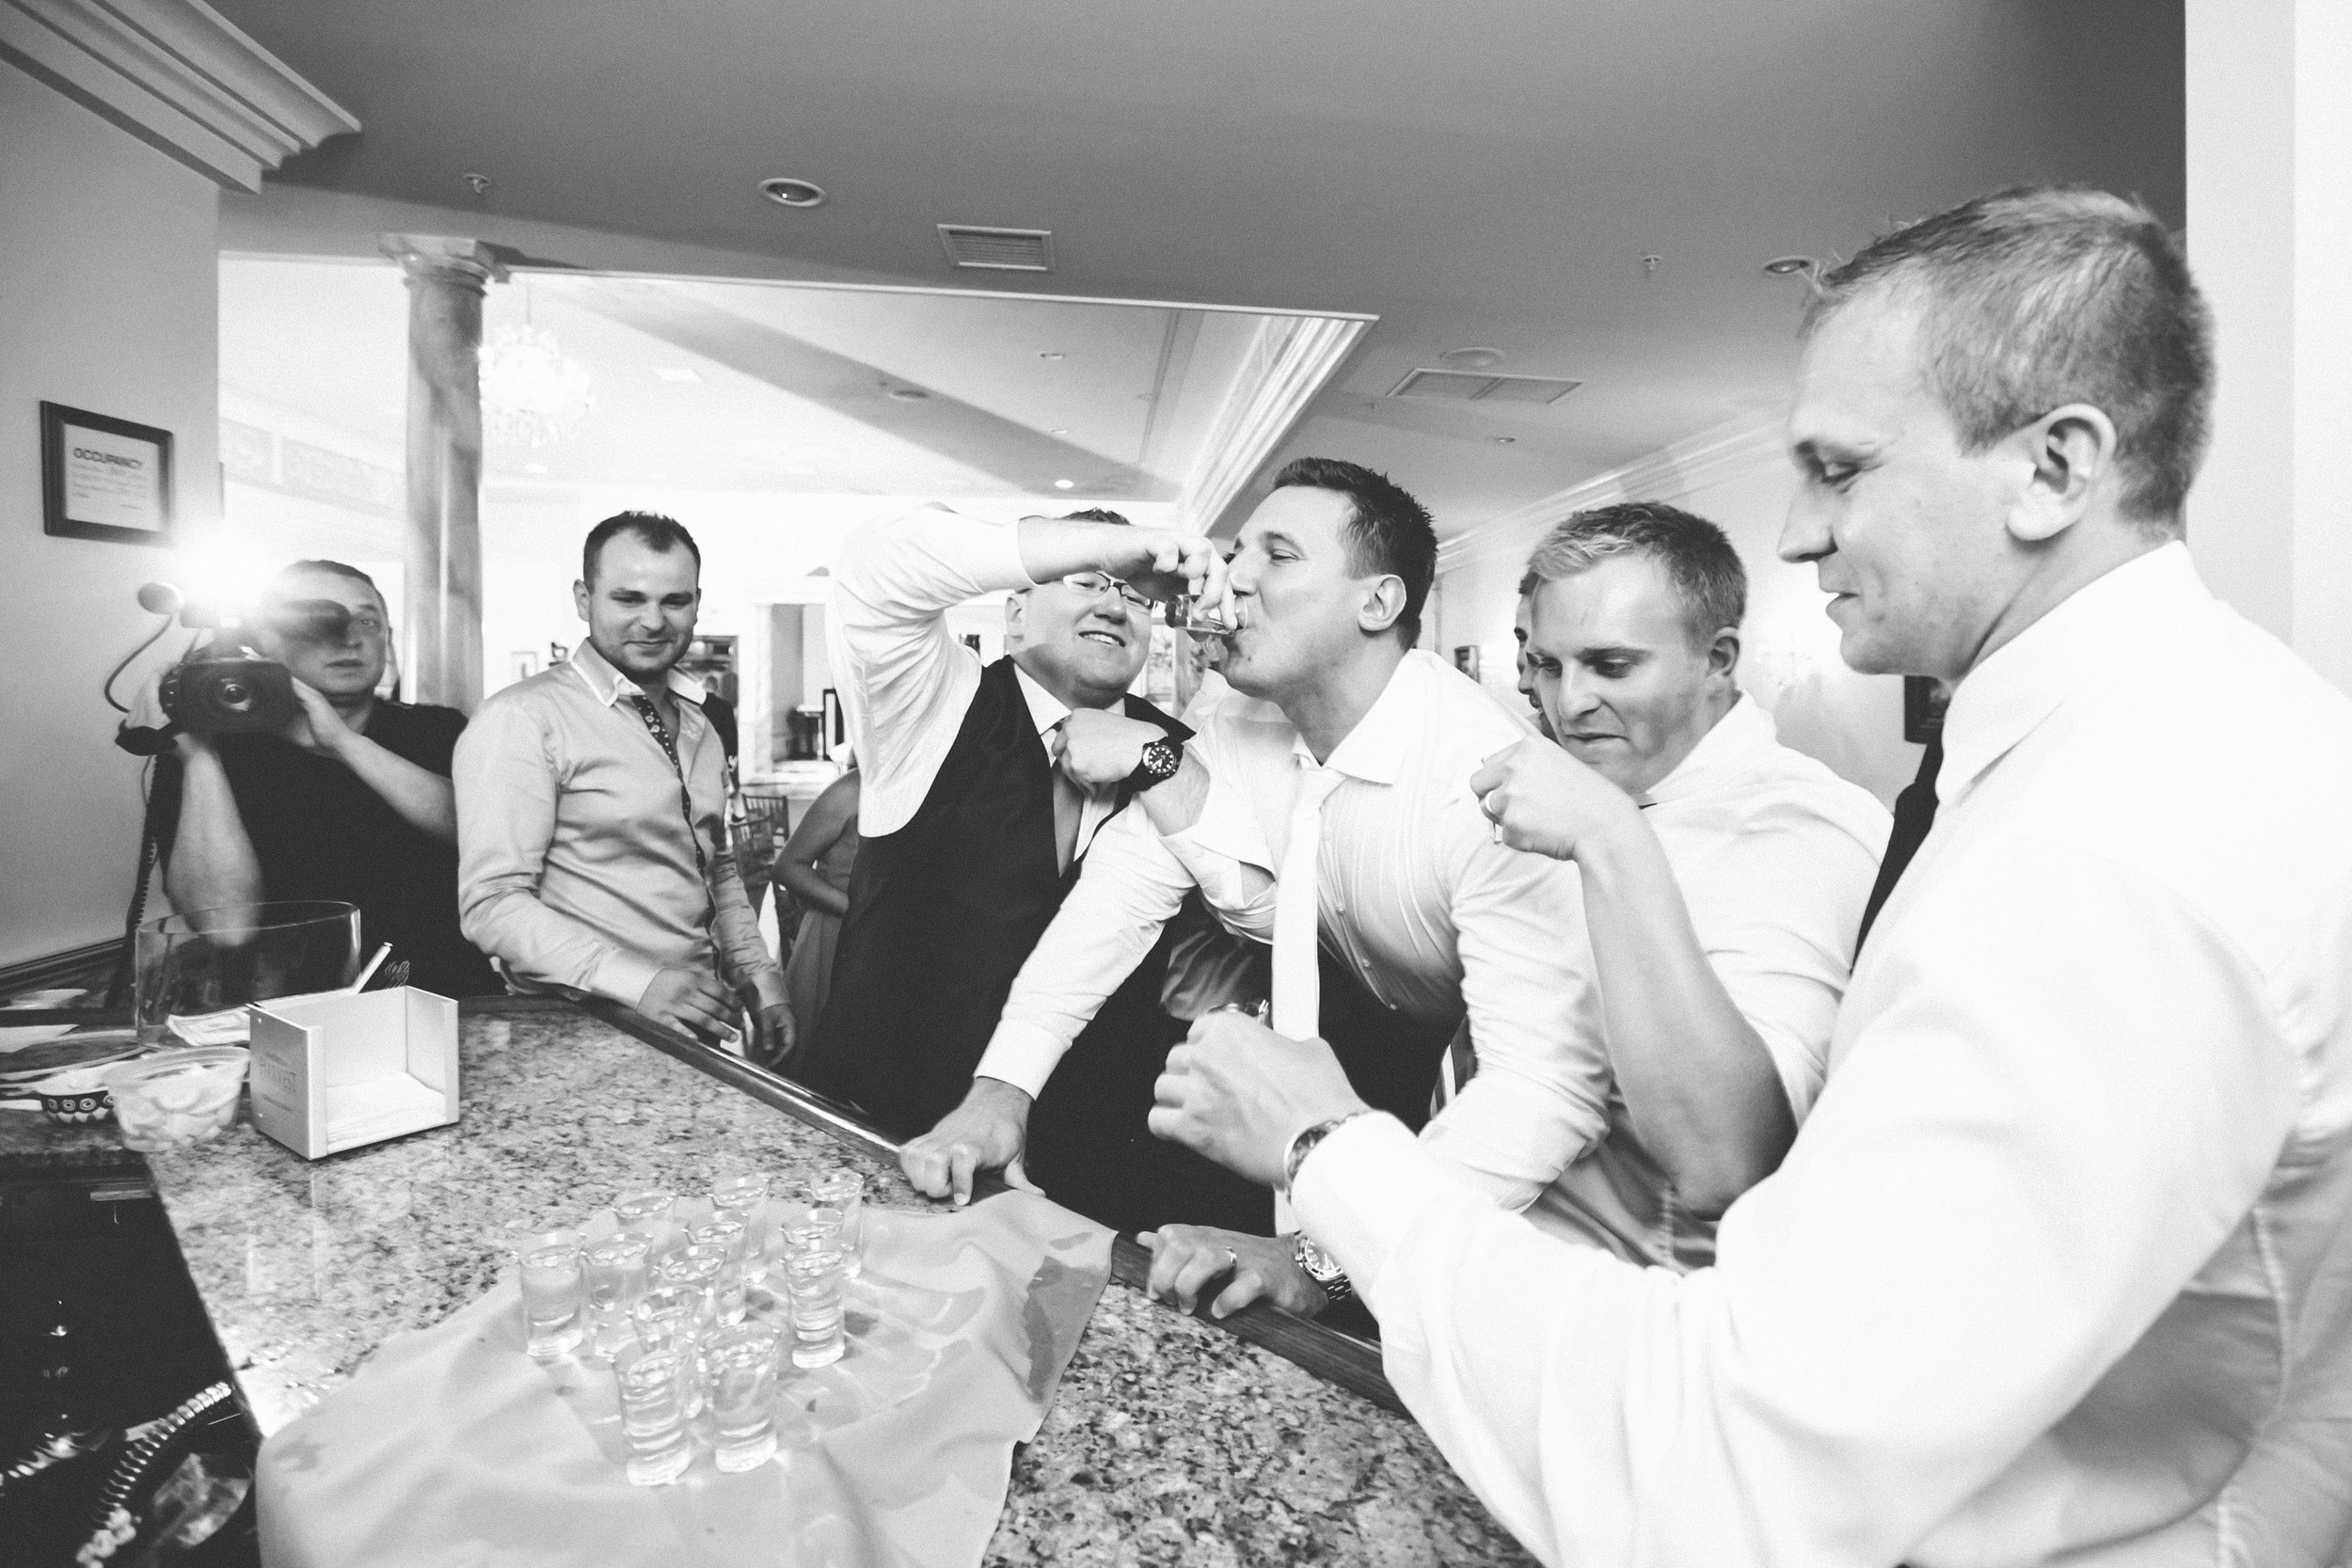 Traditional-Polish-Wedding-New-Britain-Connecticut-Jacek-Dolata-Baltic-Restaurant-15.jpg